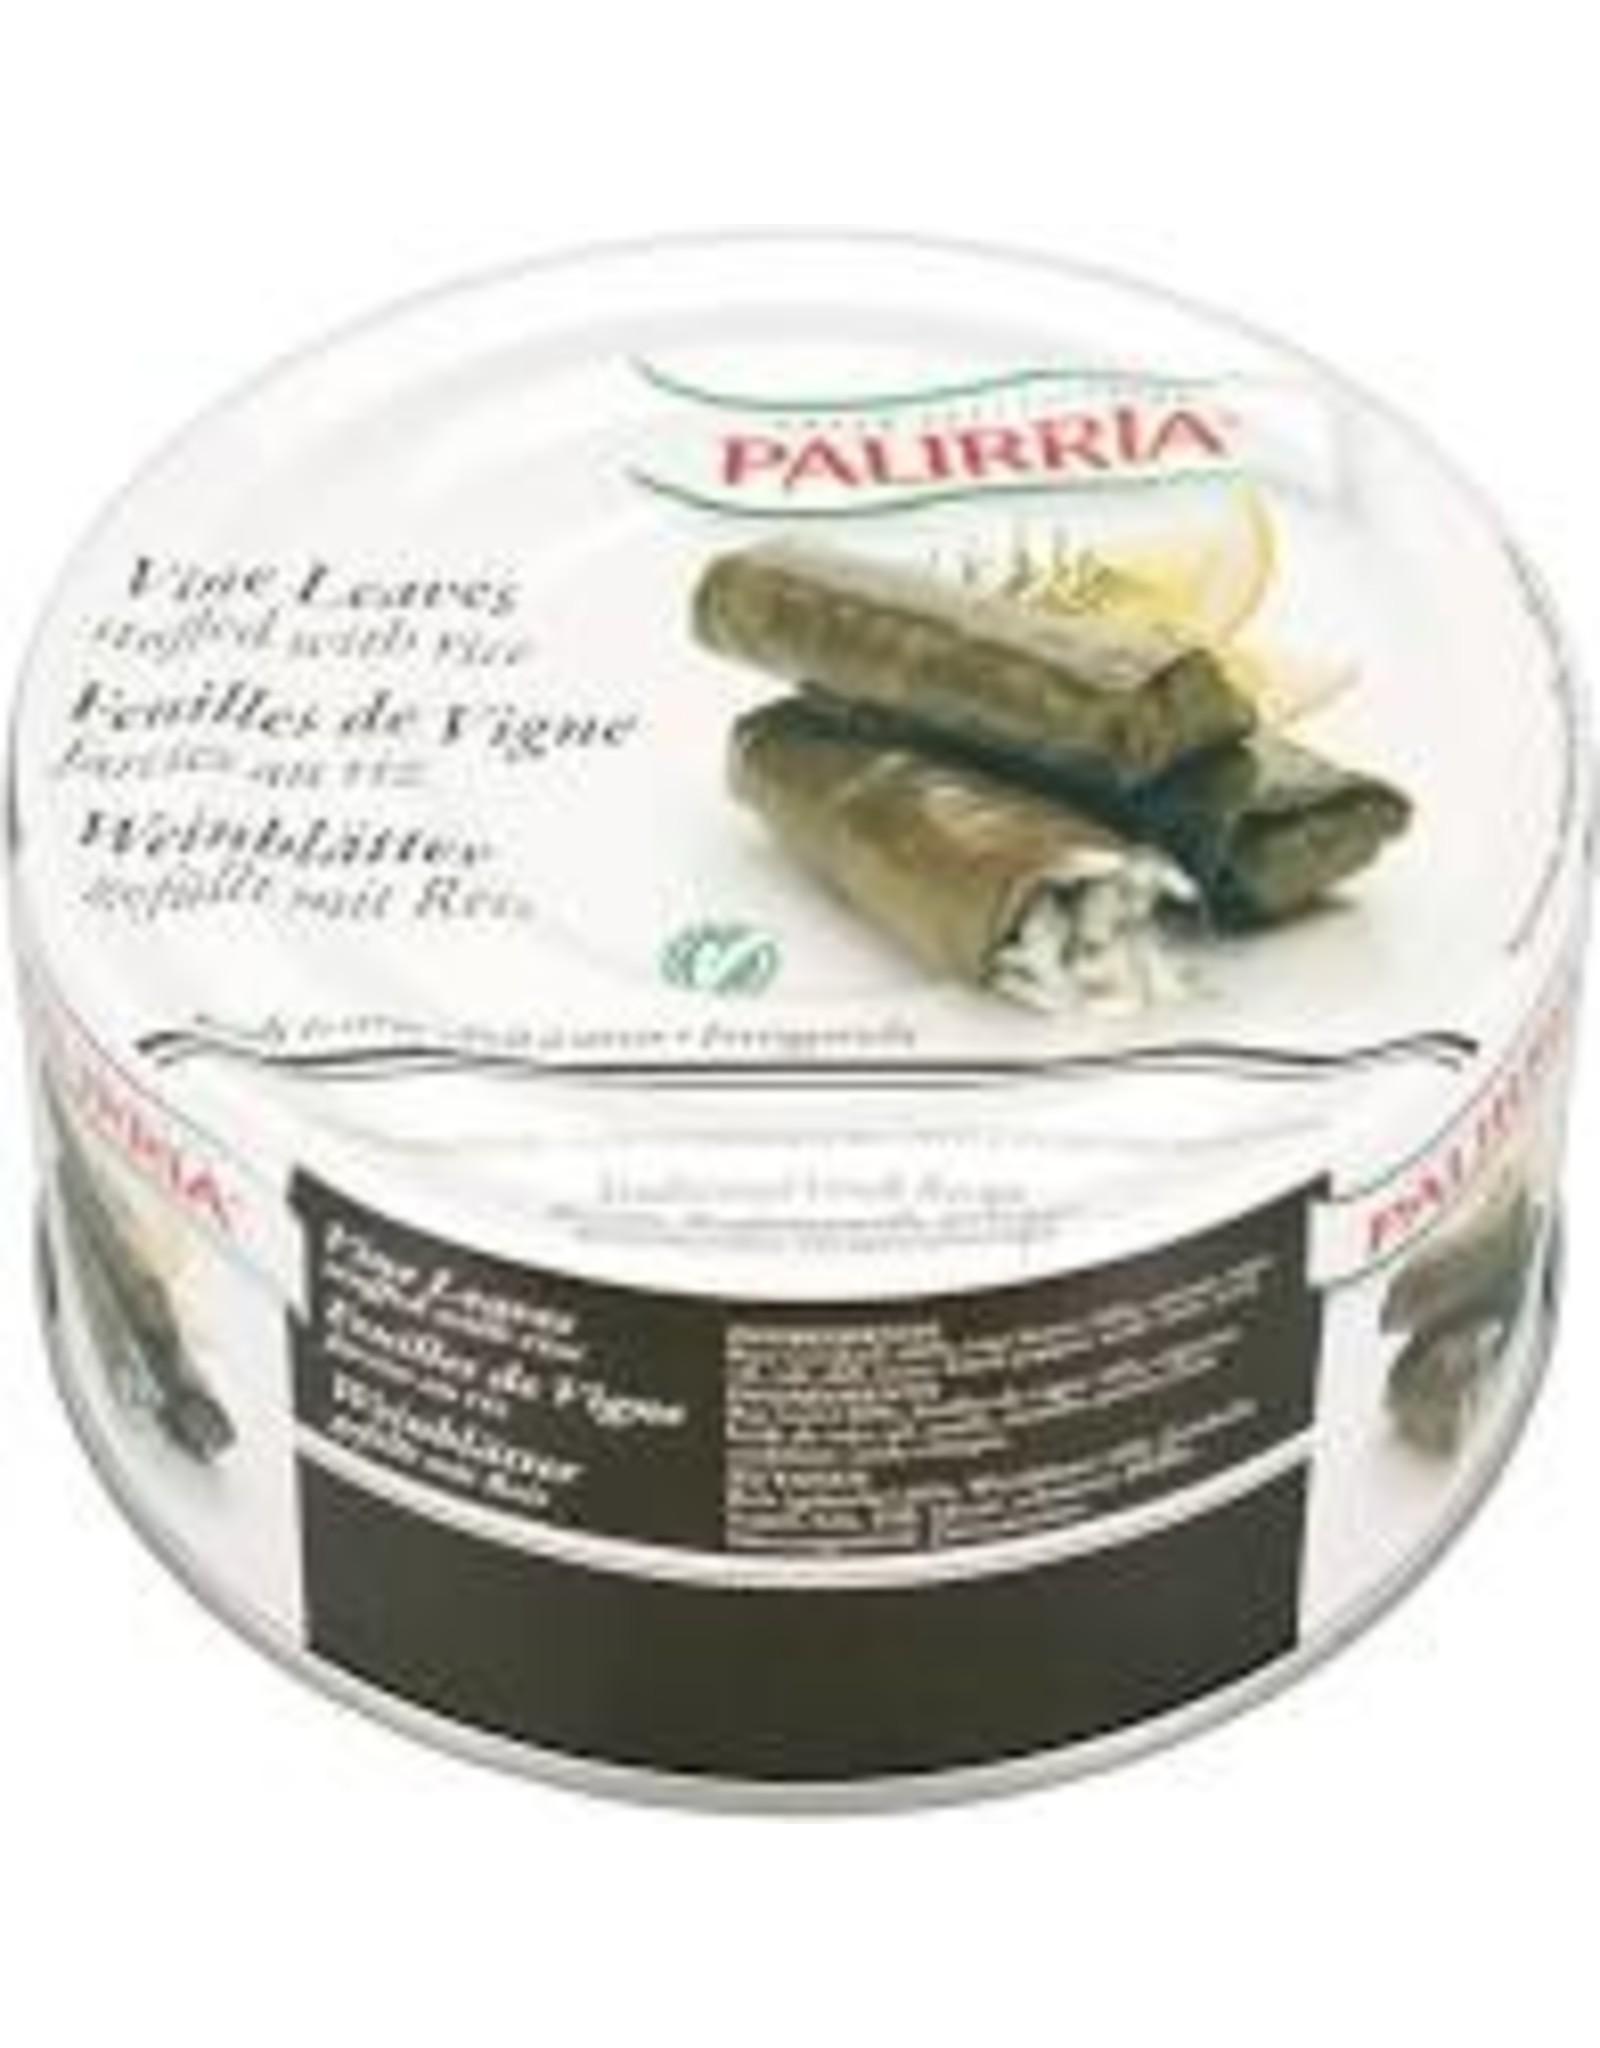 Dolma Stuffed with Rice 10 oz can